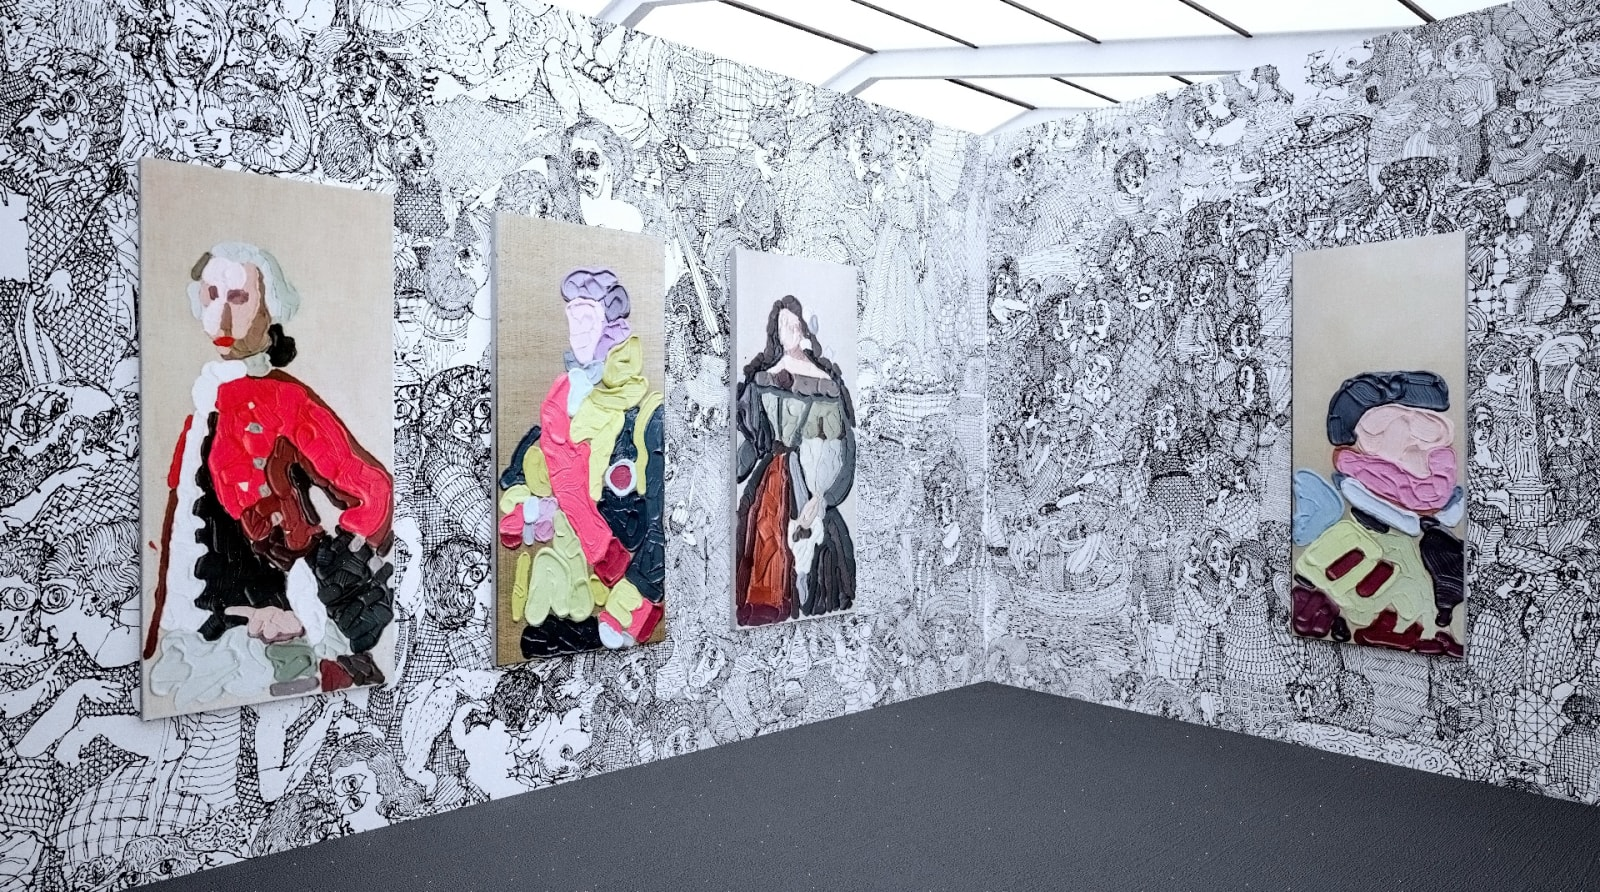 Works by José Lerma at Frieze New York (Installation View), 2020, Kavi Gupta